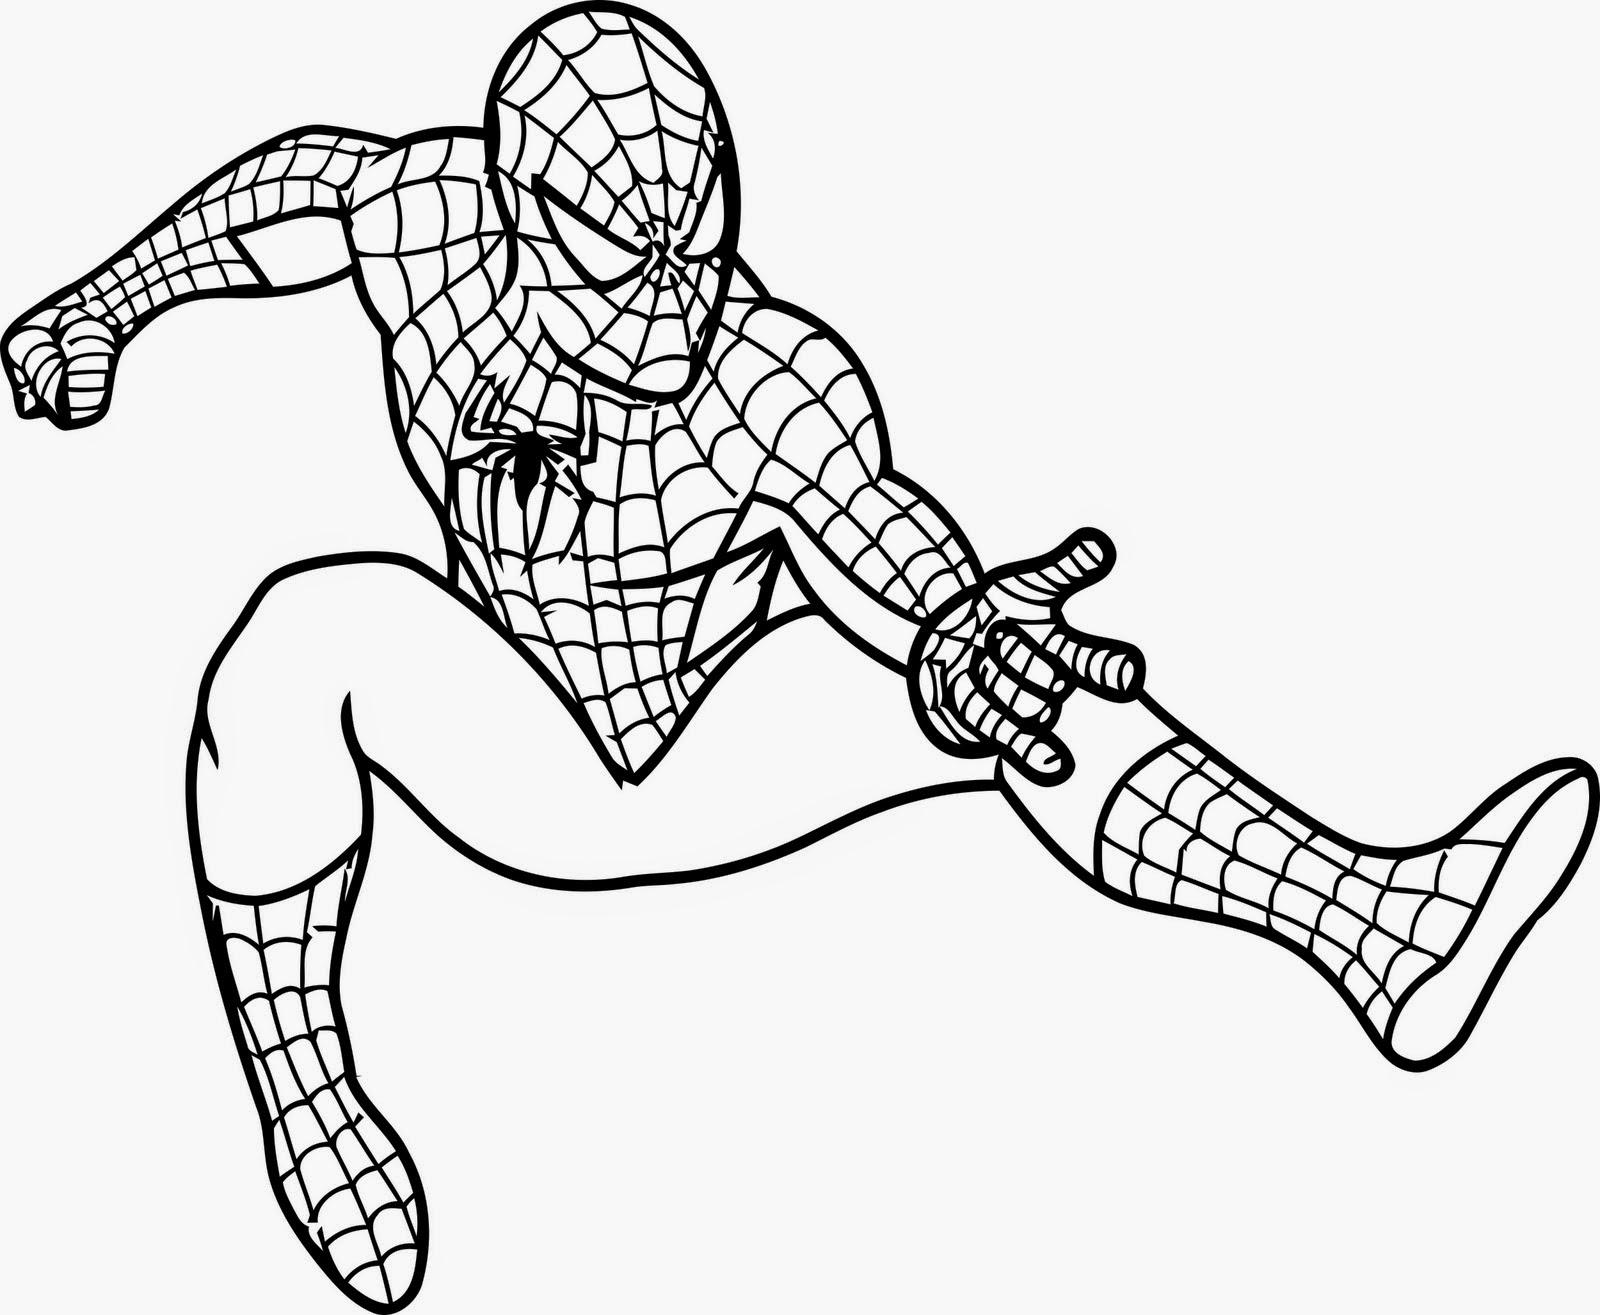 Mewarnai Gambar Mewarnai Gambar Superhero Spiderman